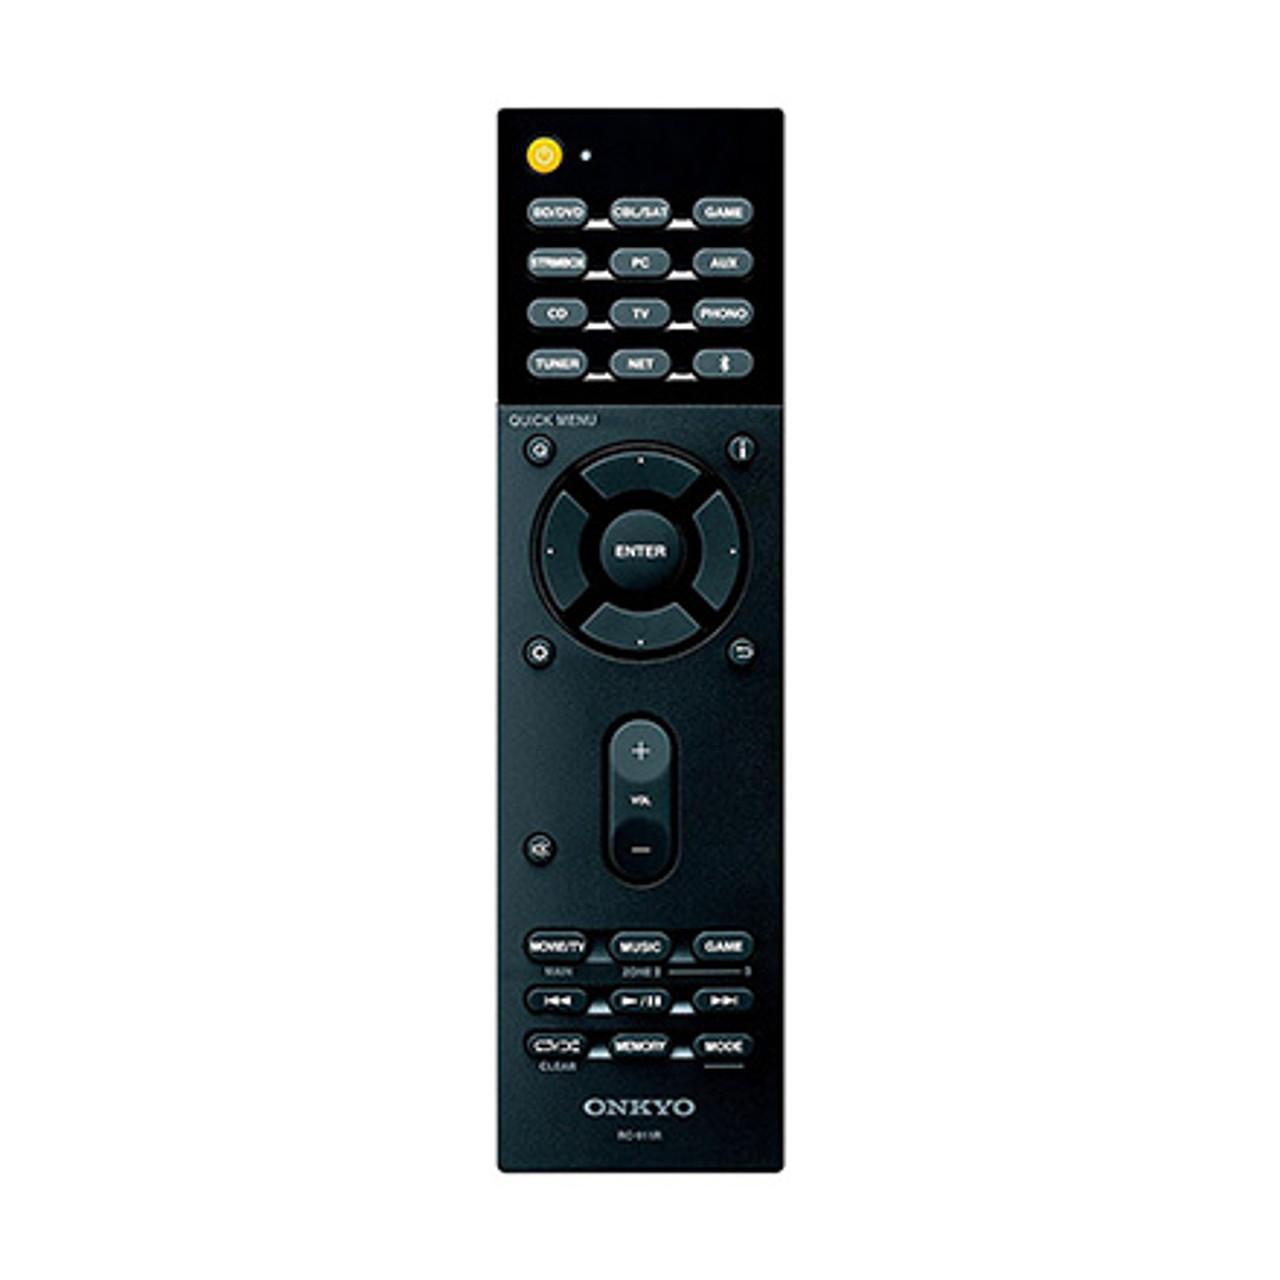 Onkyo® TX-RZ720 7.2-Channel THX Certified Network A/V Receiver